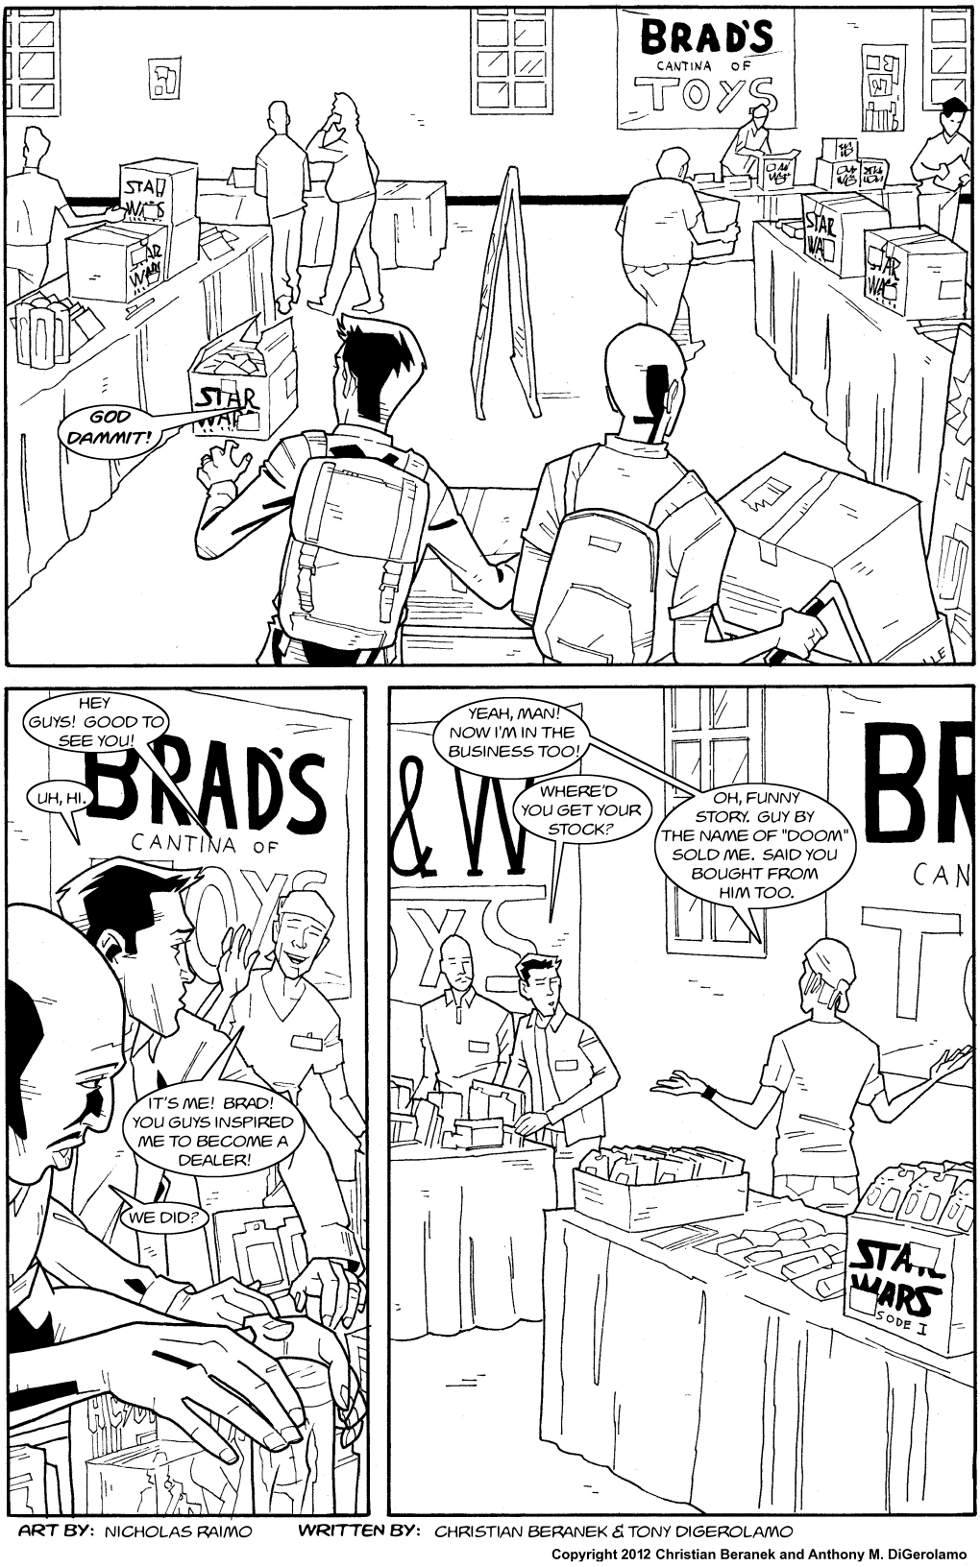 Dealers:  The Bandwagon